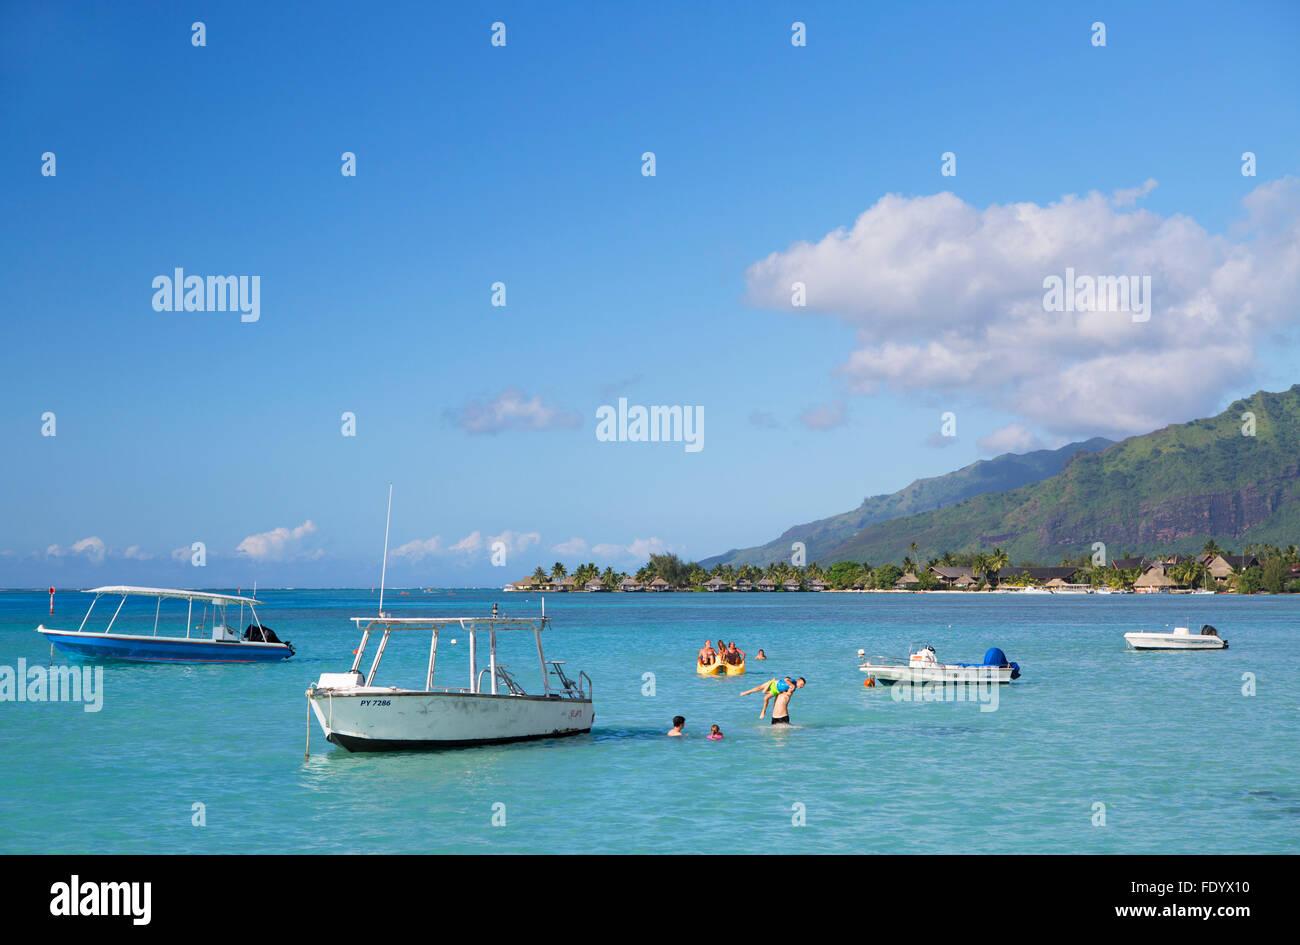 Hauru Point, Mo'orea, Islas Sociedad, Polinesia Francesa Foto de stock